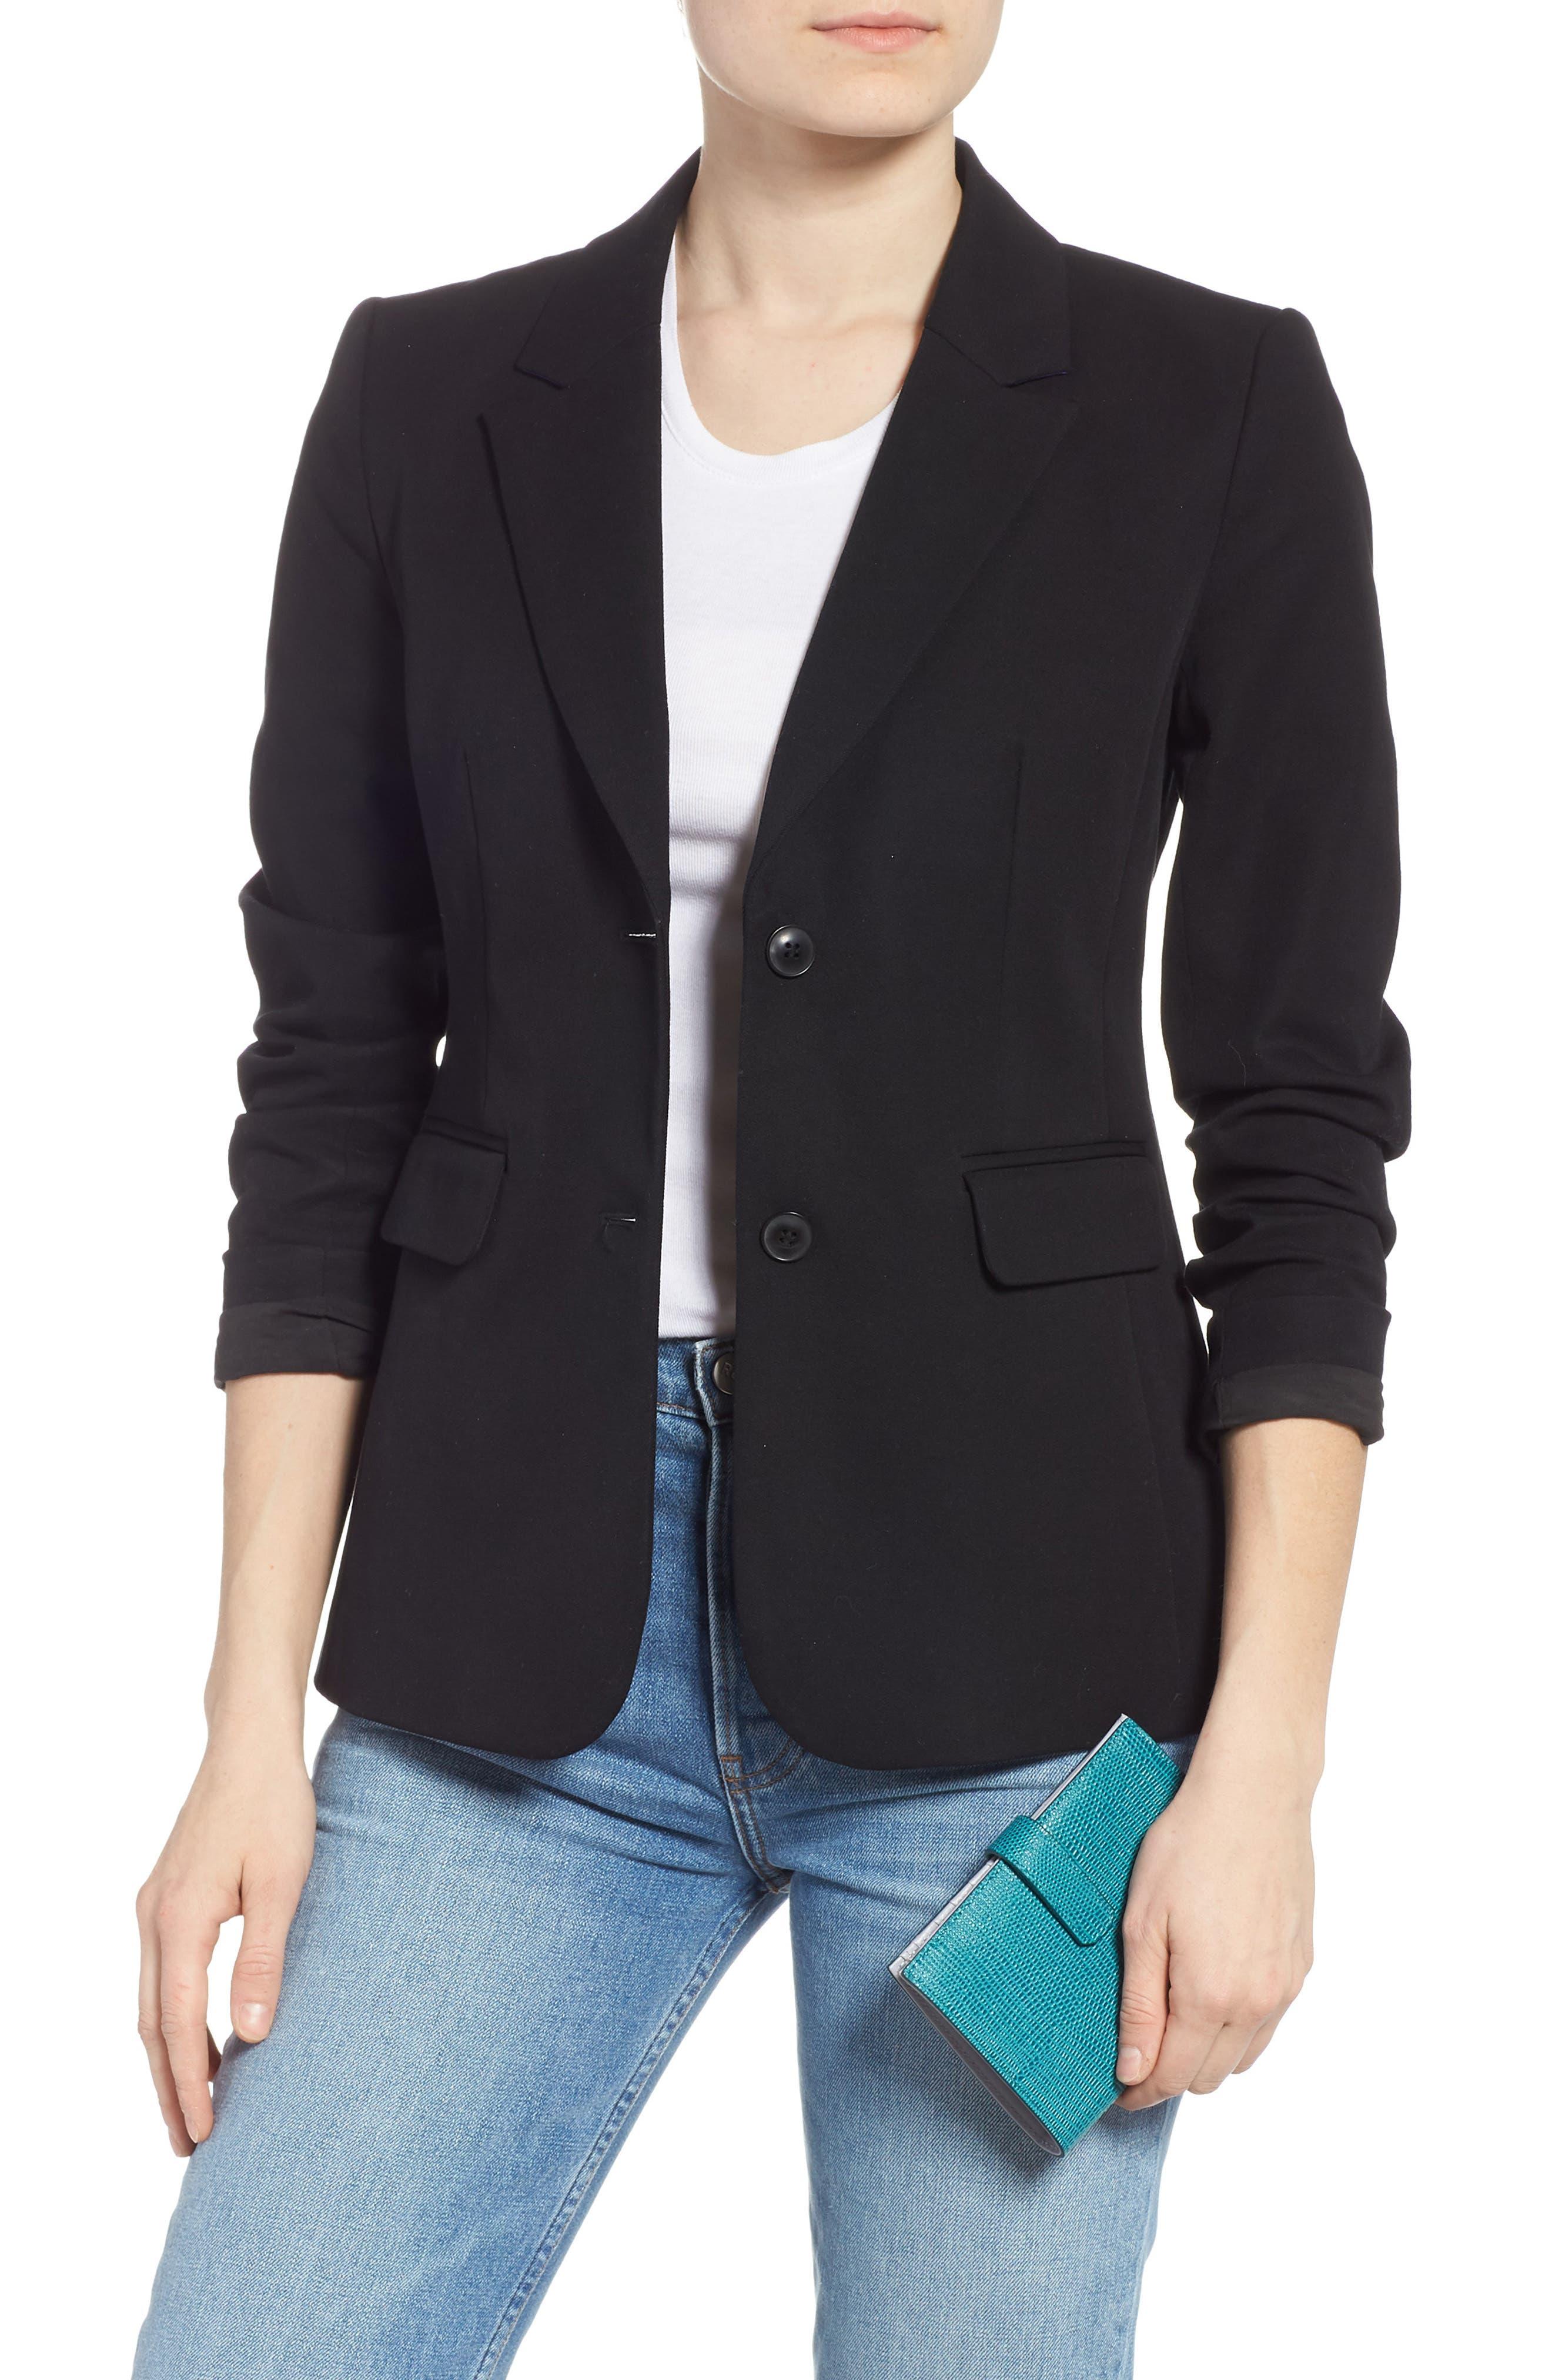 Lauren Lizard Embossed Leather Bifold Wallet,                             Alternate thumbnail 3, color,                             TEAL HARBOR